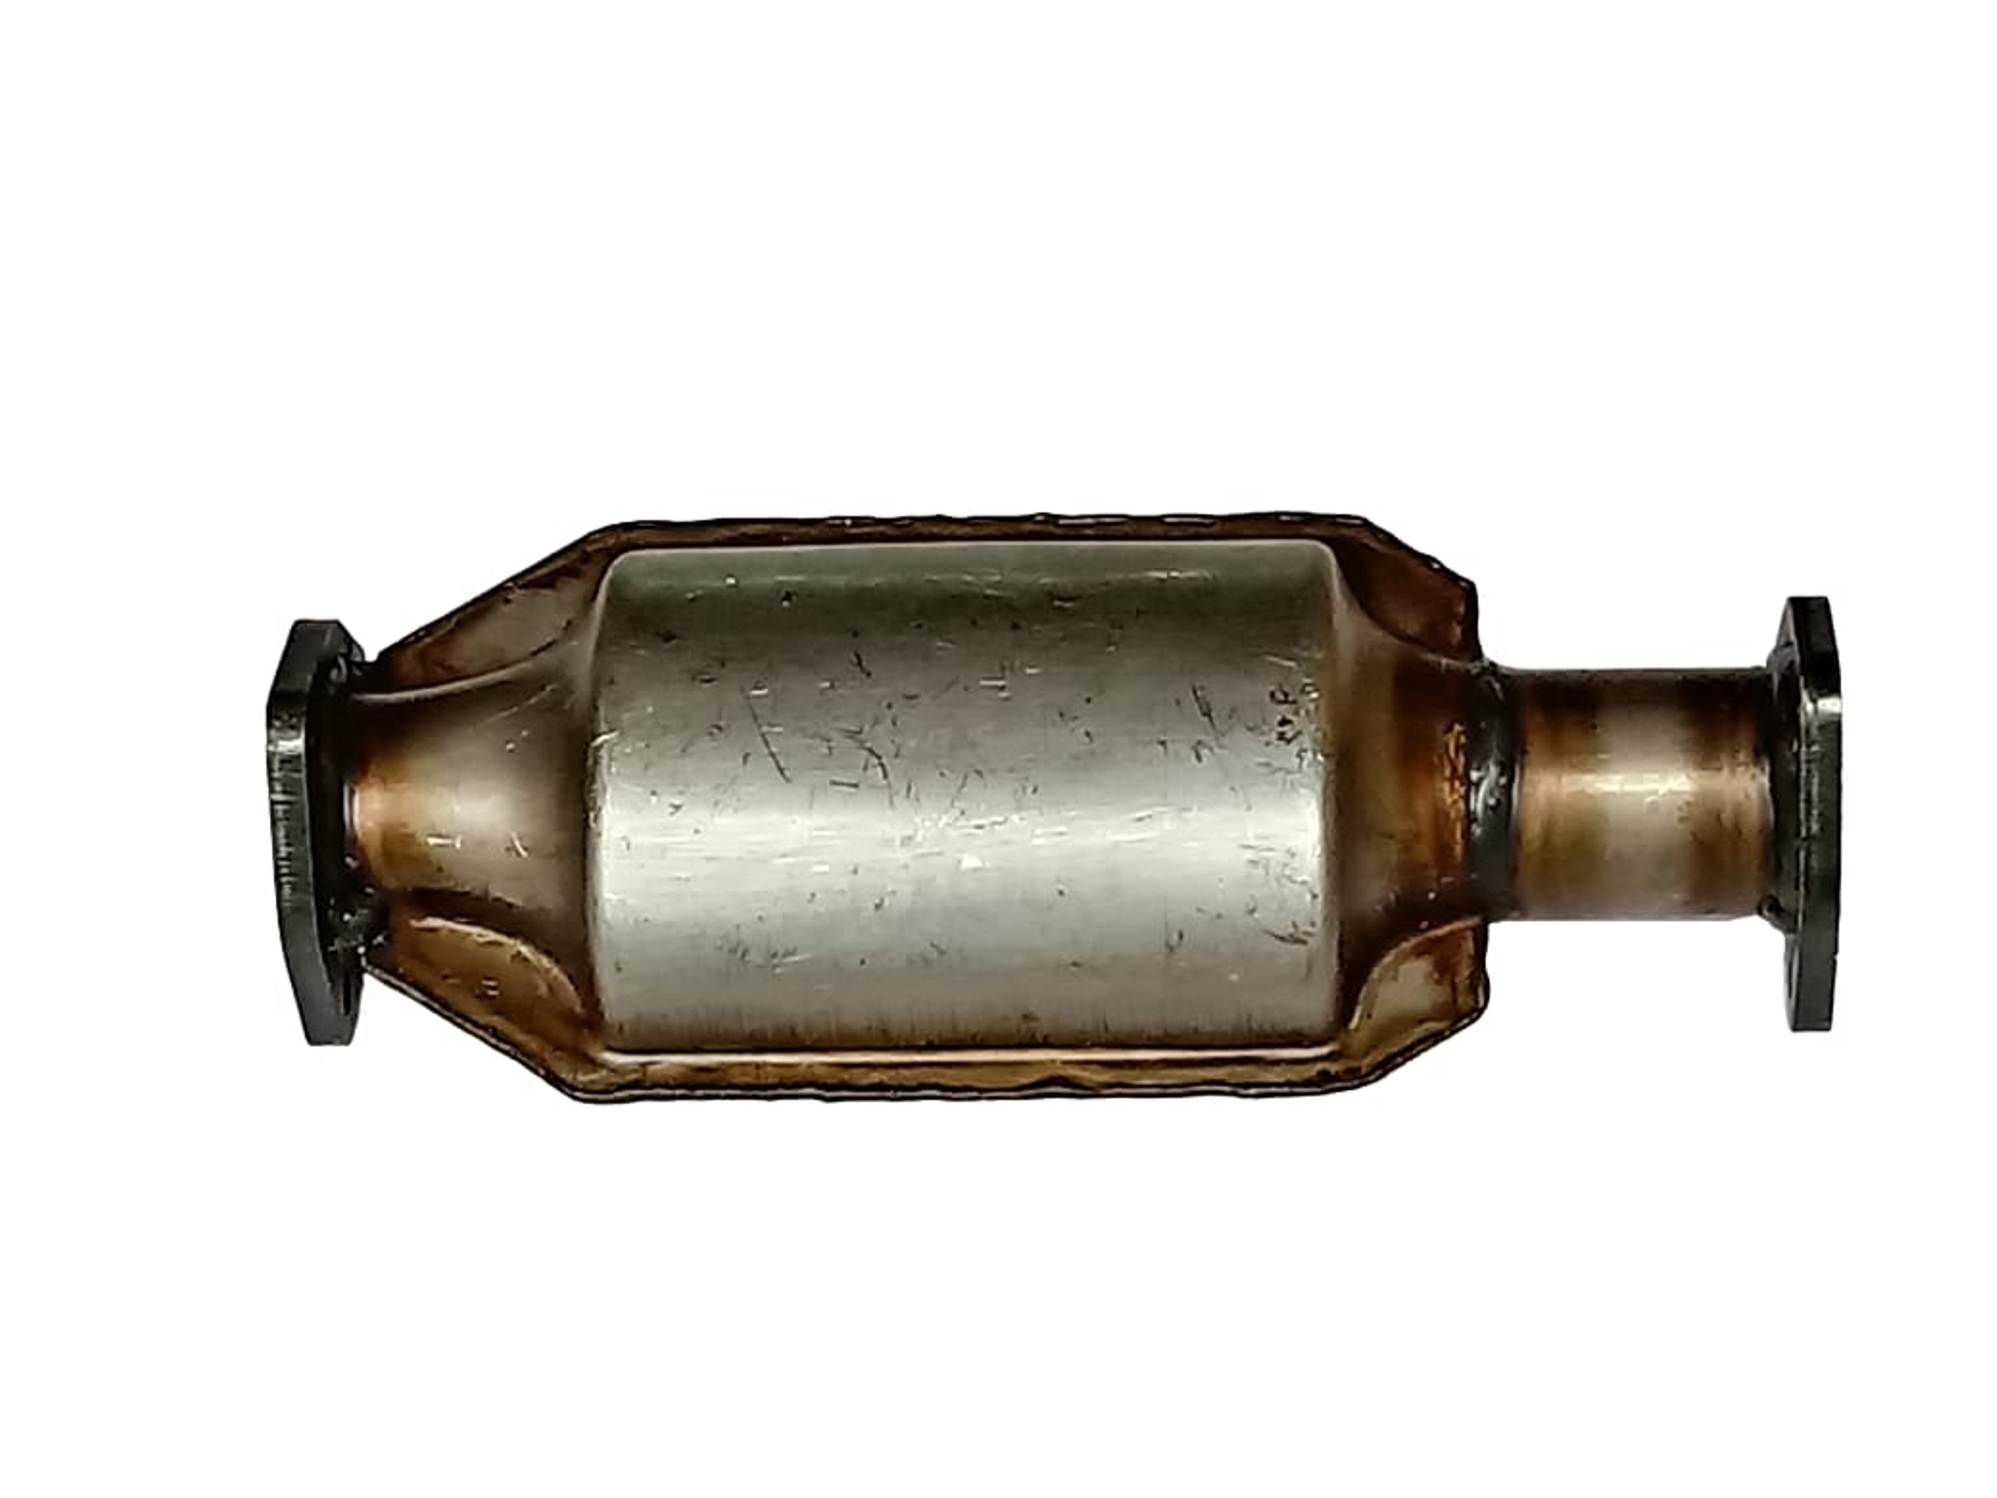 Catalisador Gol/Parati - 1.6 94/96